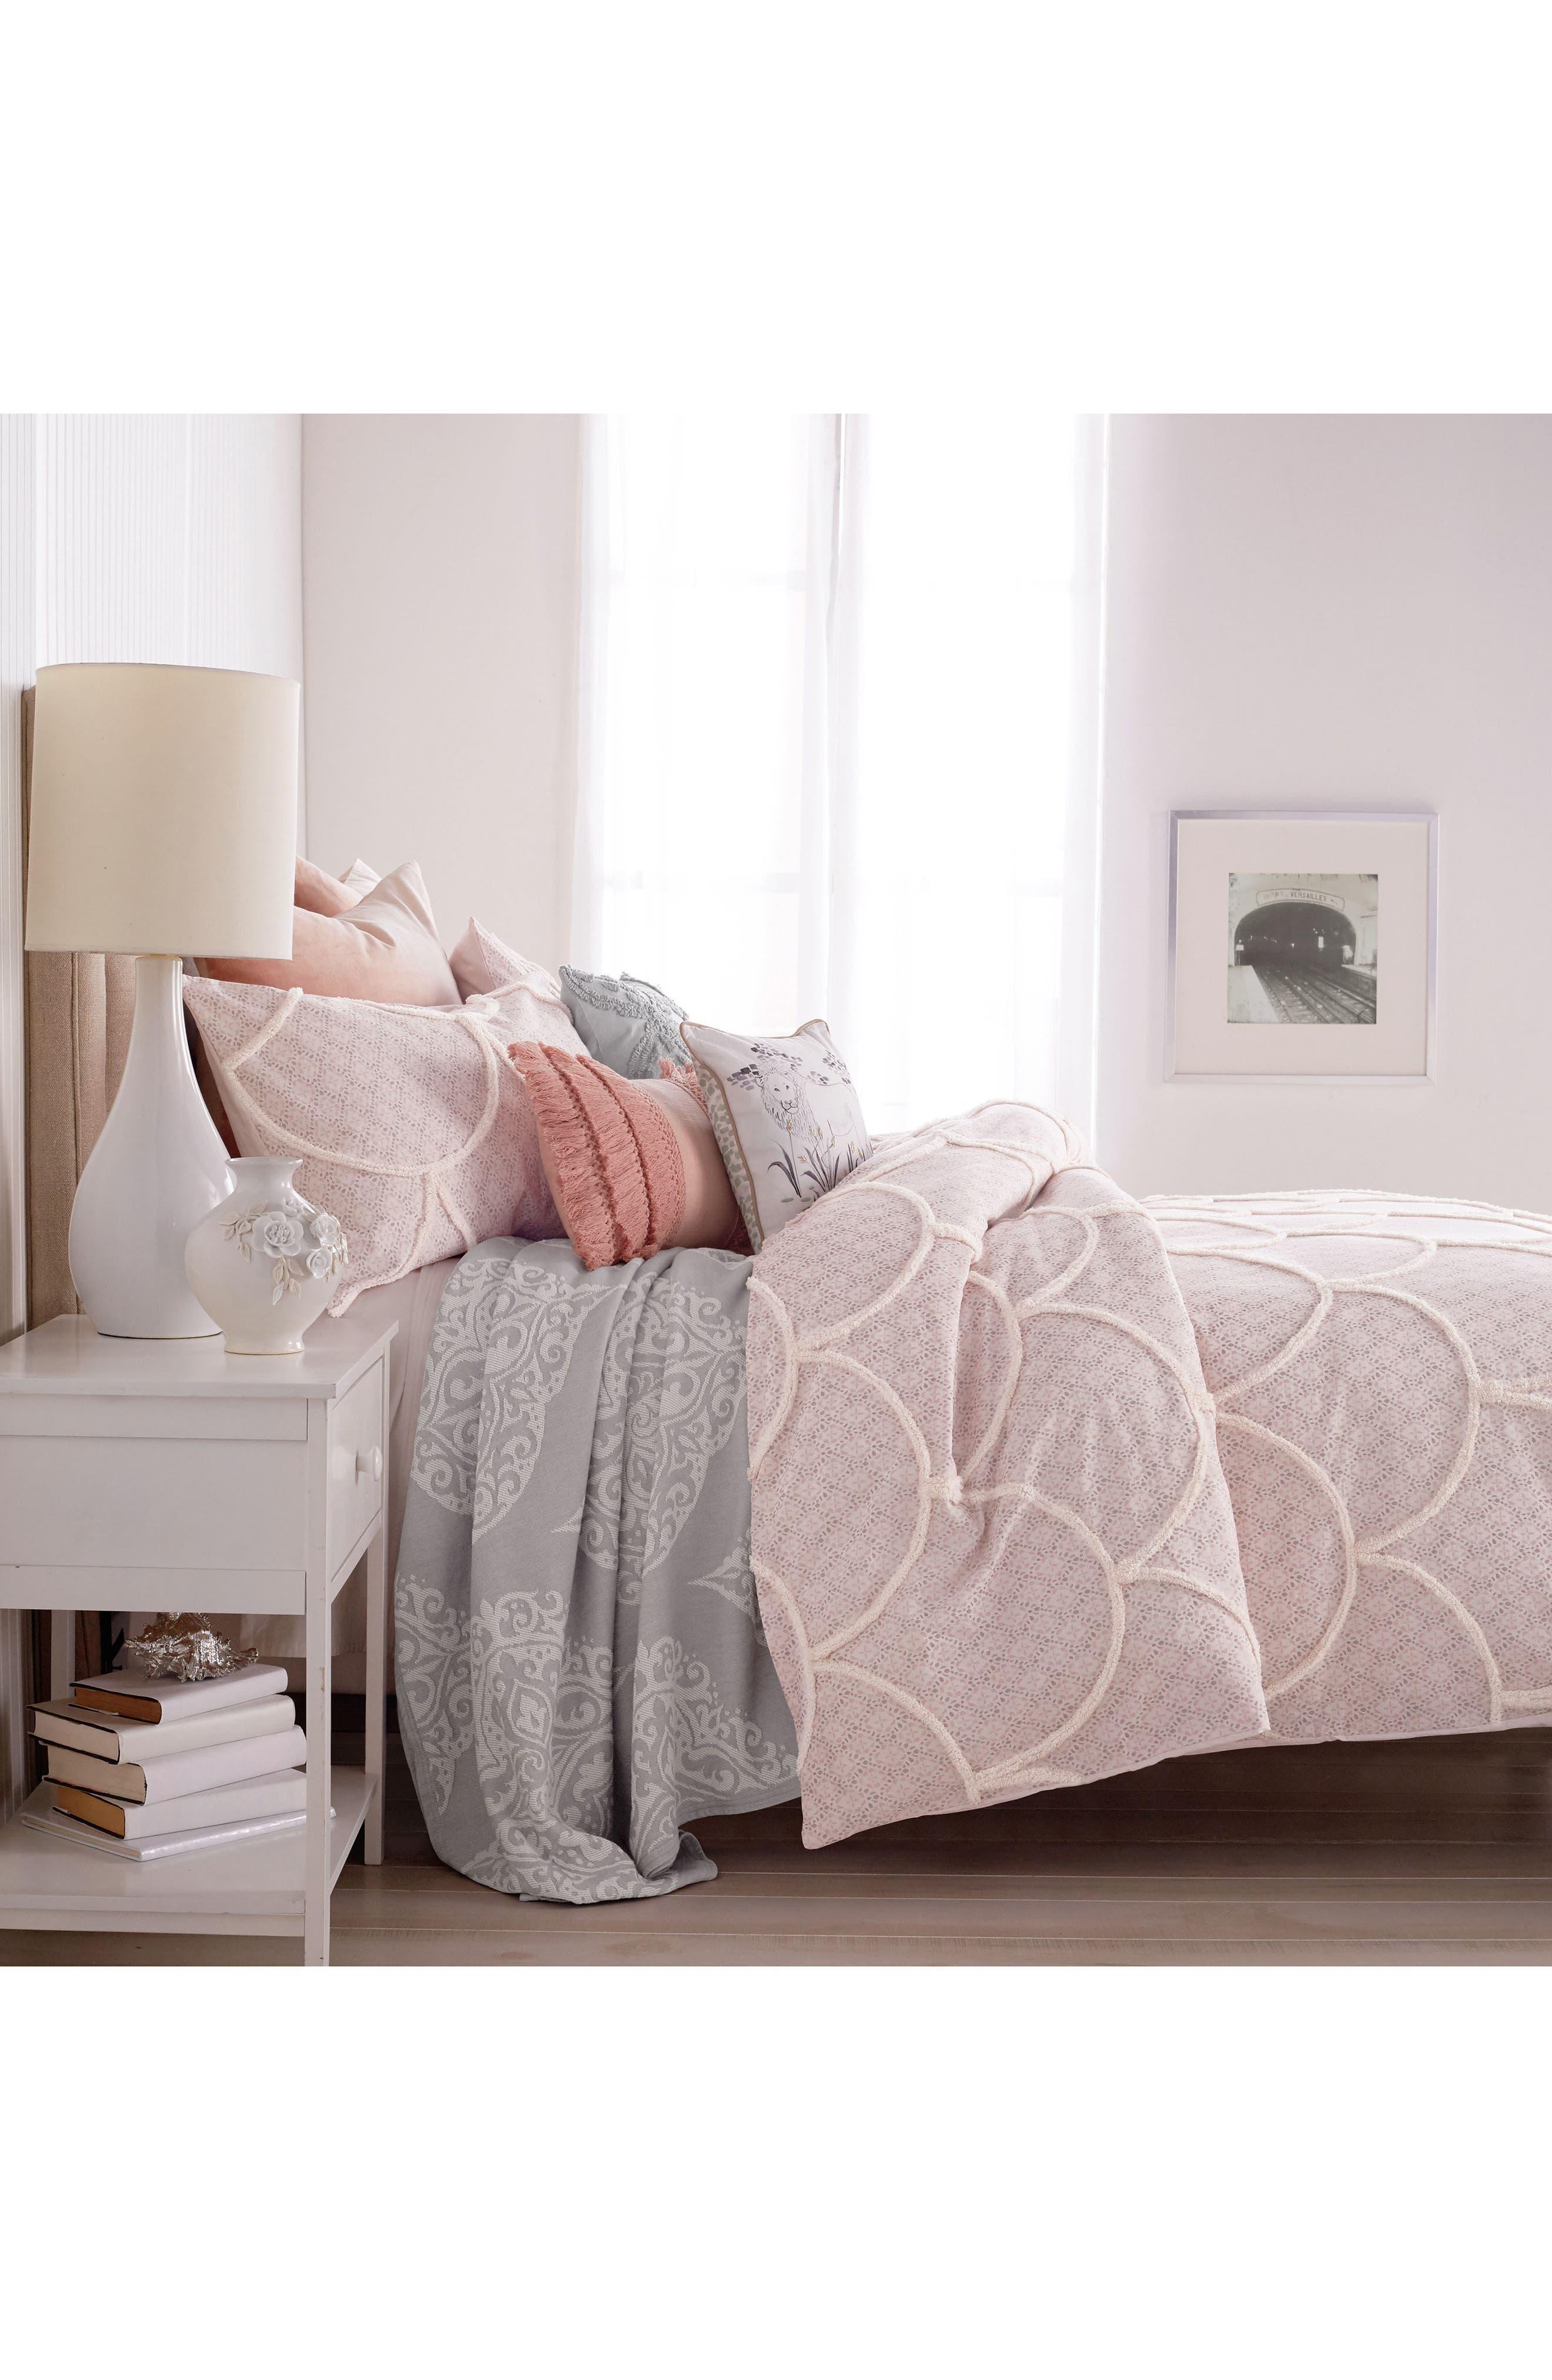 Chenille Scallop Comforter & Sham Set,                             Alternate thumbnail 2, color,                             650